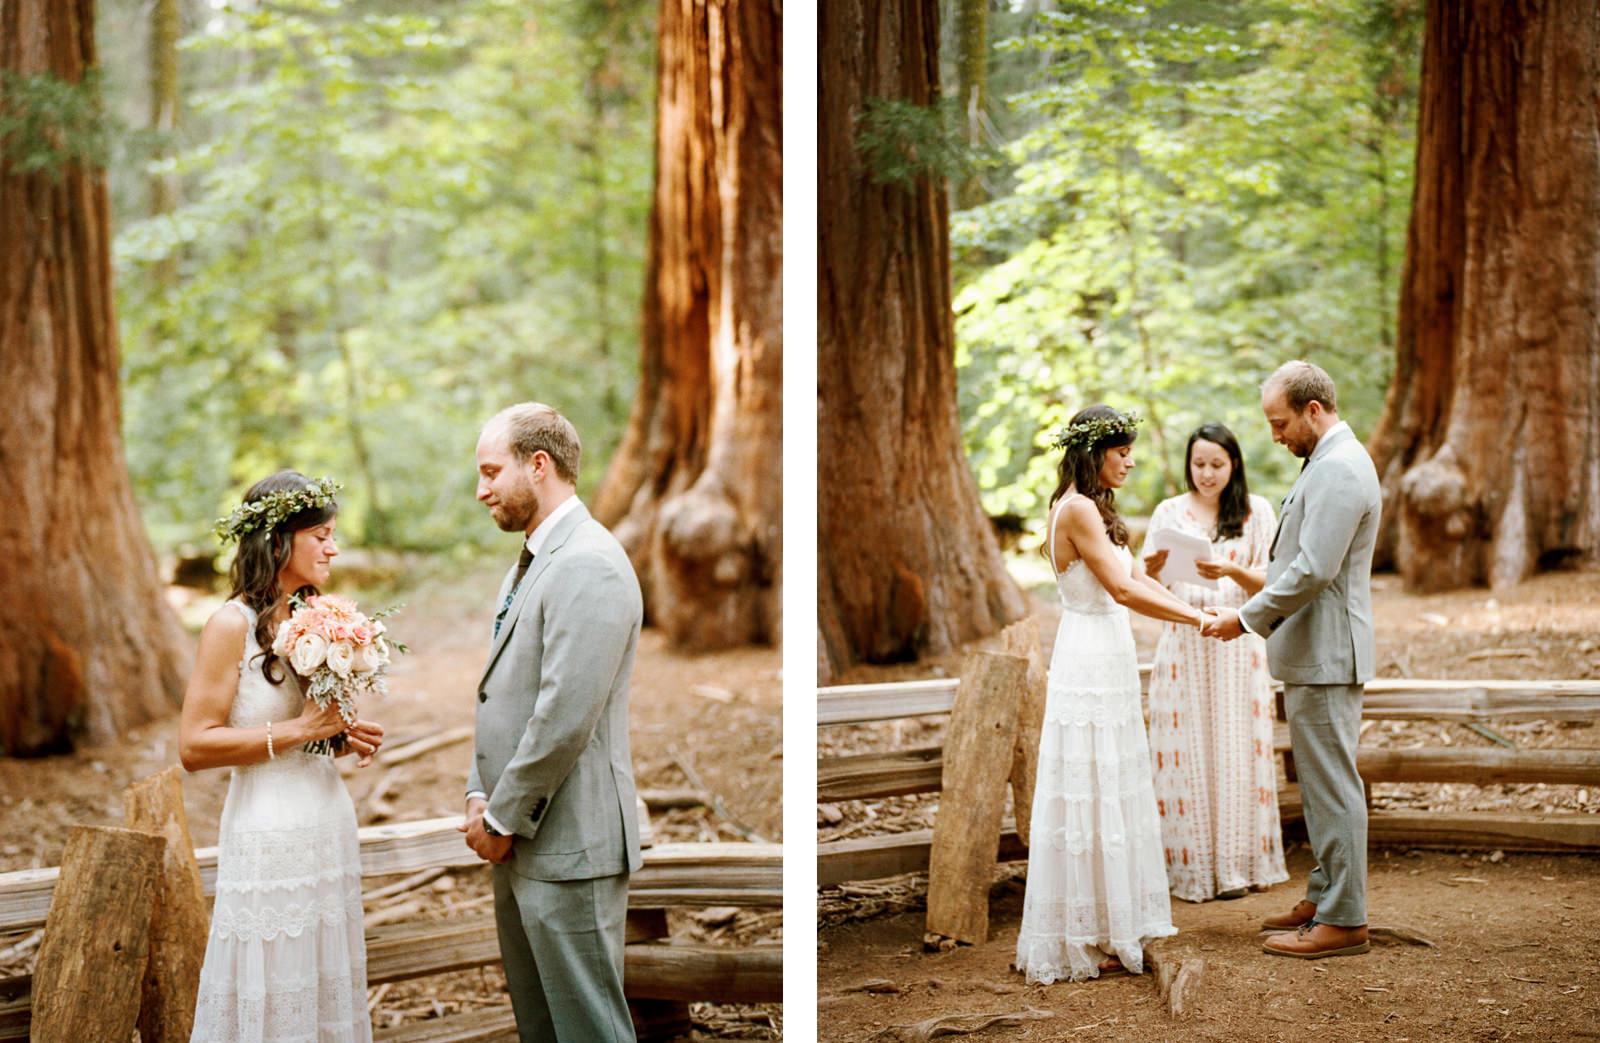 yosemite-intimate-wedding-043 YOSEMITE INTIMATE WEDDING